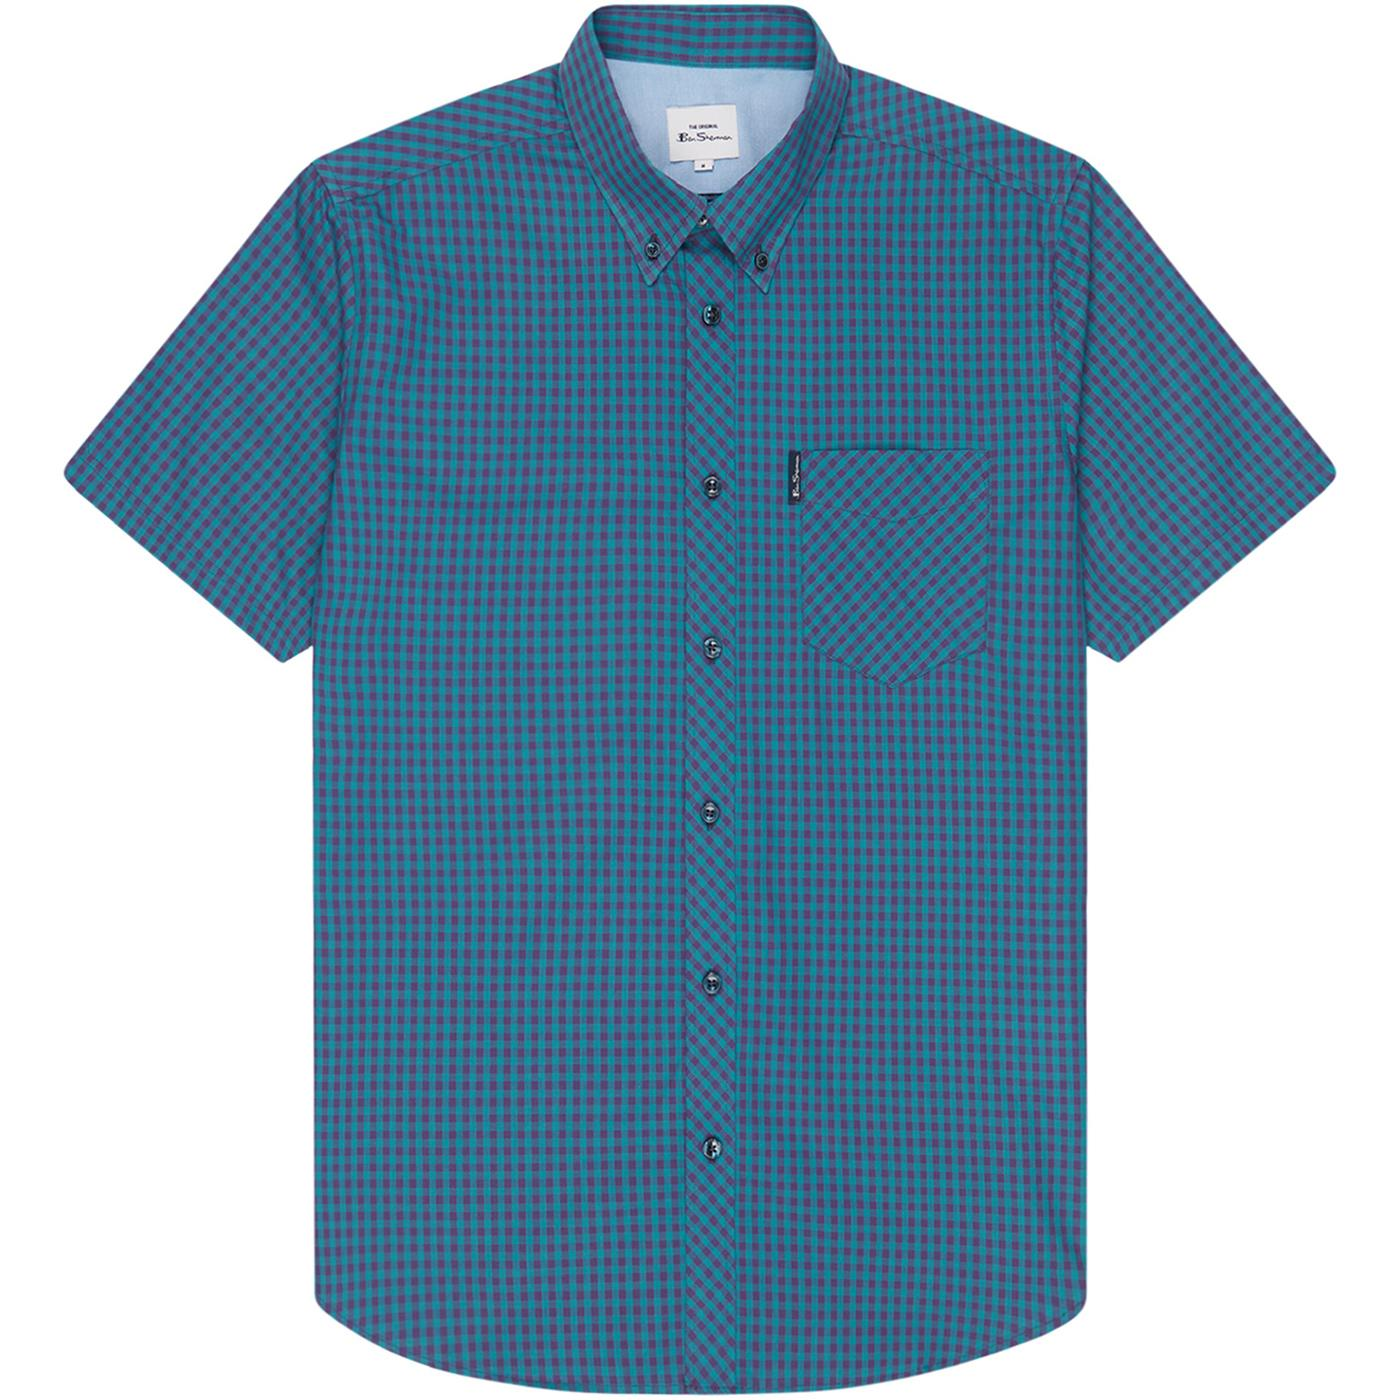 BEN SHERMAN Classic Mod SS Gingham Shirt (Plum)